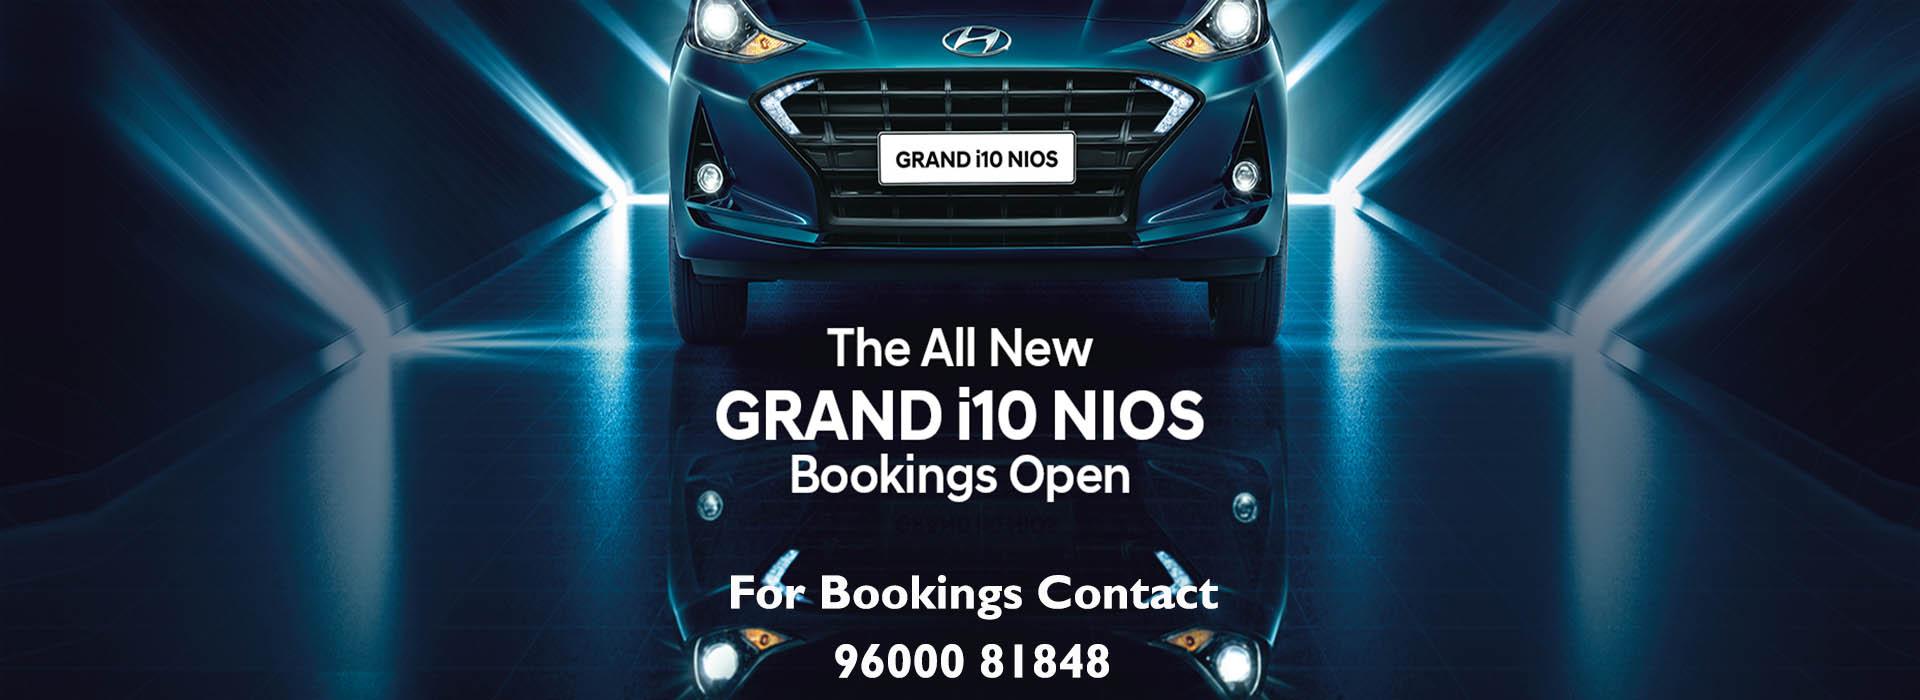 Hyundai Car Dealer Showroom Service Center in Chennai - FPL